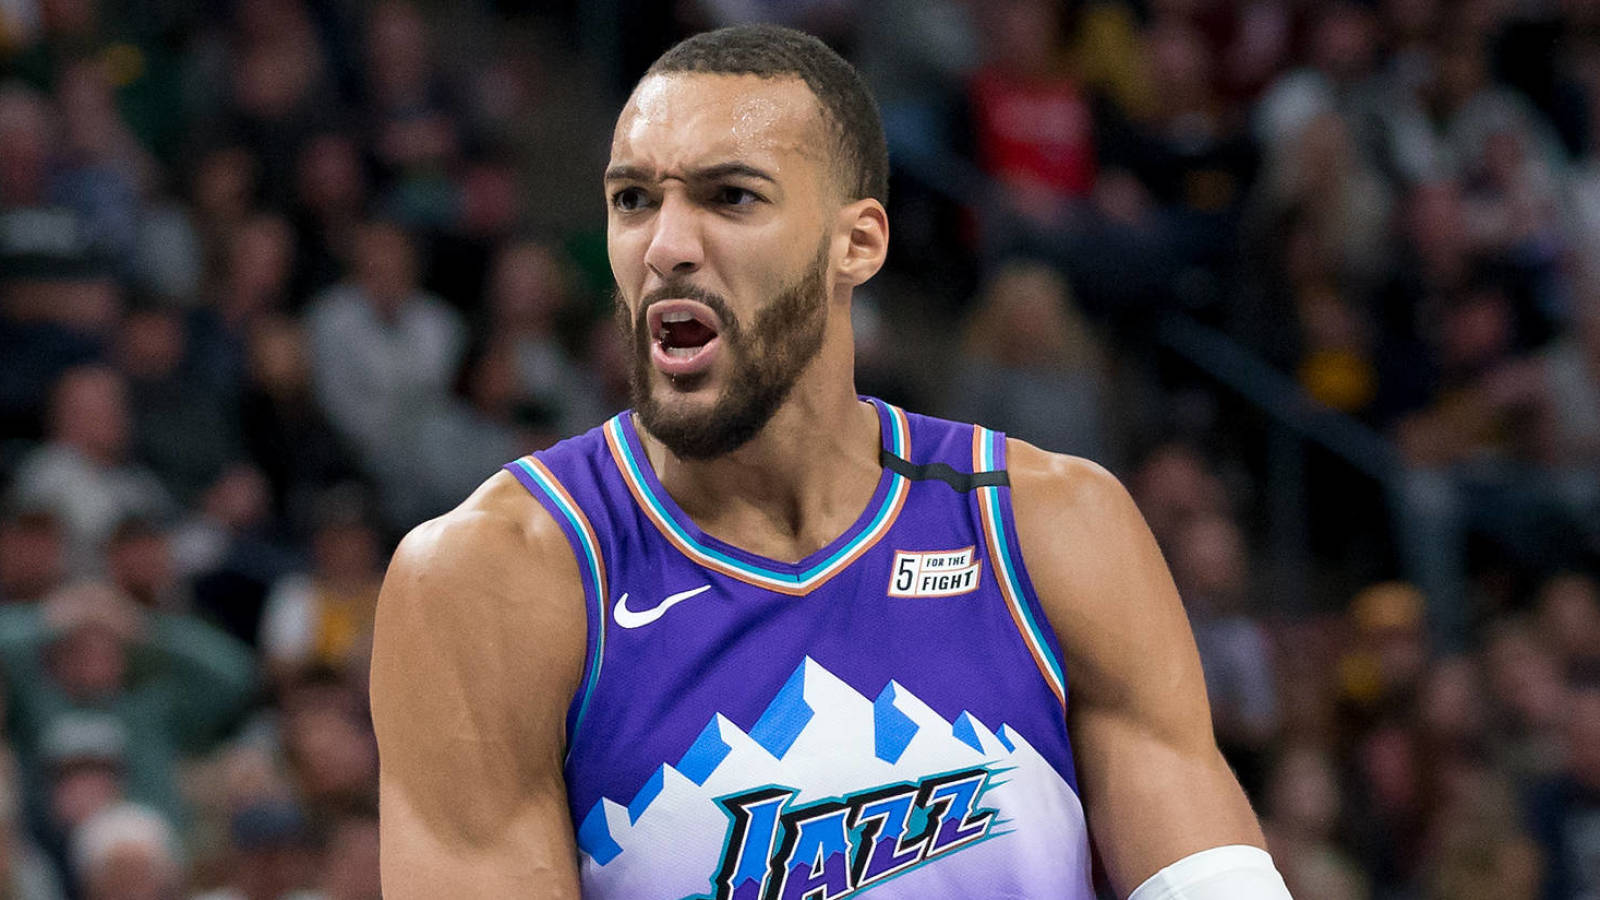 Report: NBA won't shut down if player tests positive for coronavirus